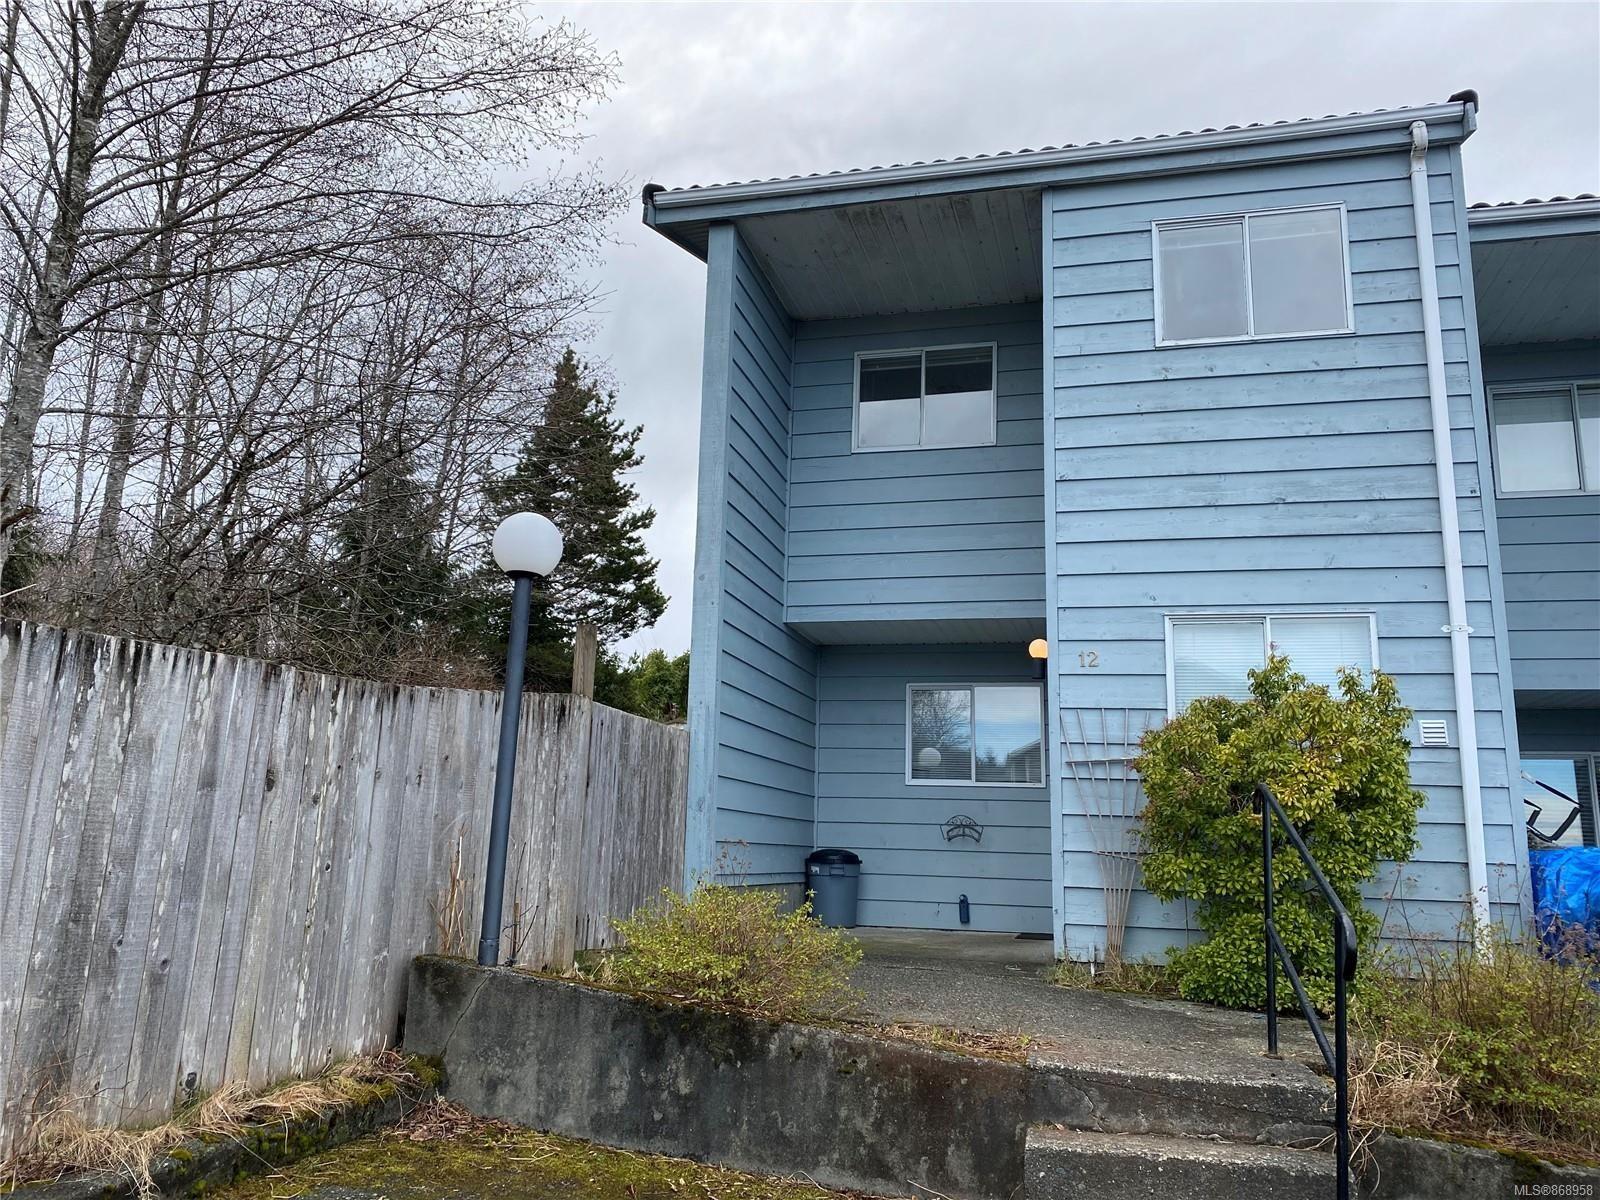 Main Photo: 12 5215 Fanshawe St in : NI Port Hardy Row/Townhouse for sale (North Island)  : MLS®# 868958